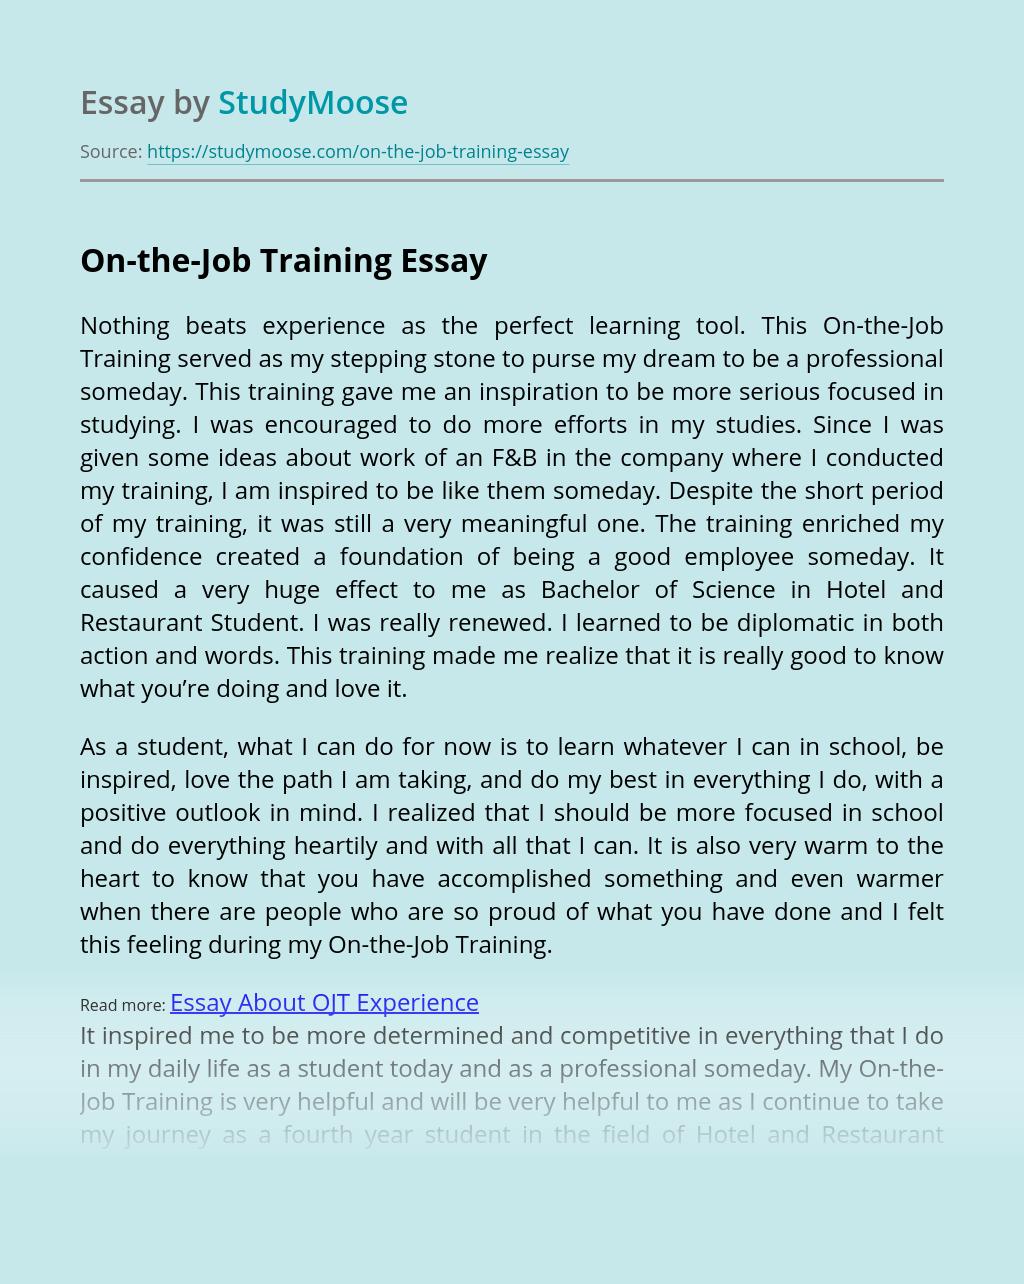 On-the-Job Training